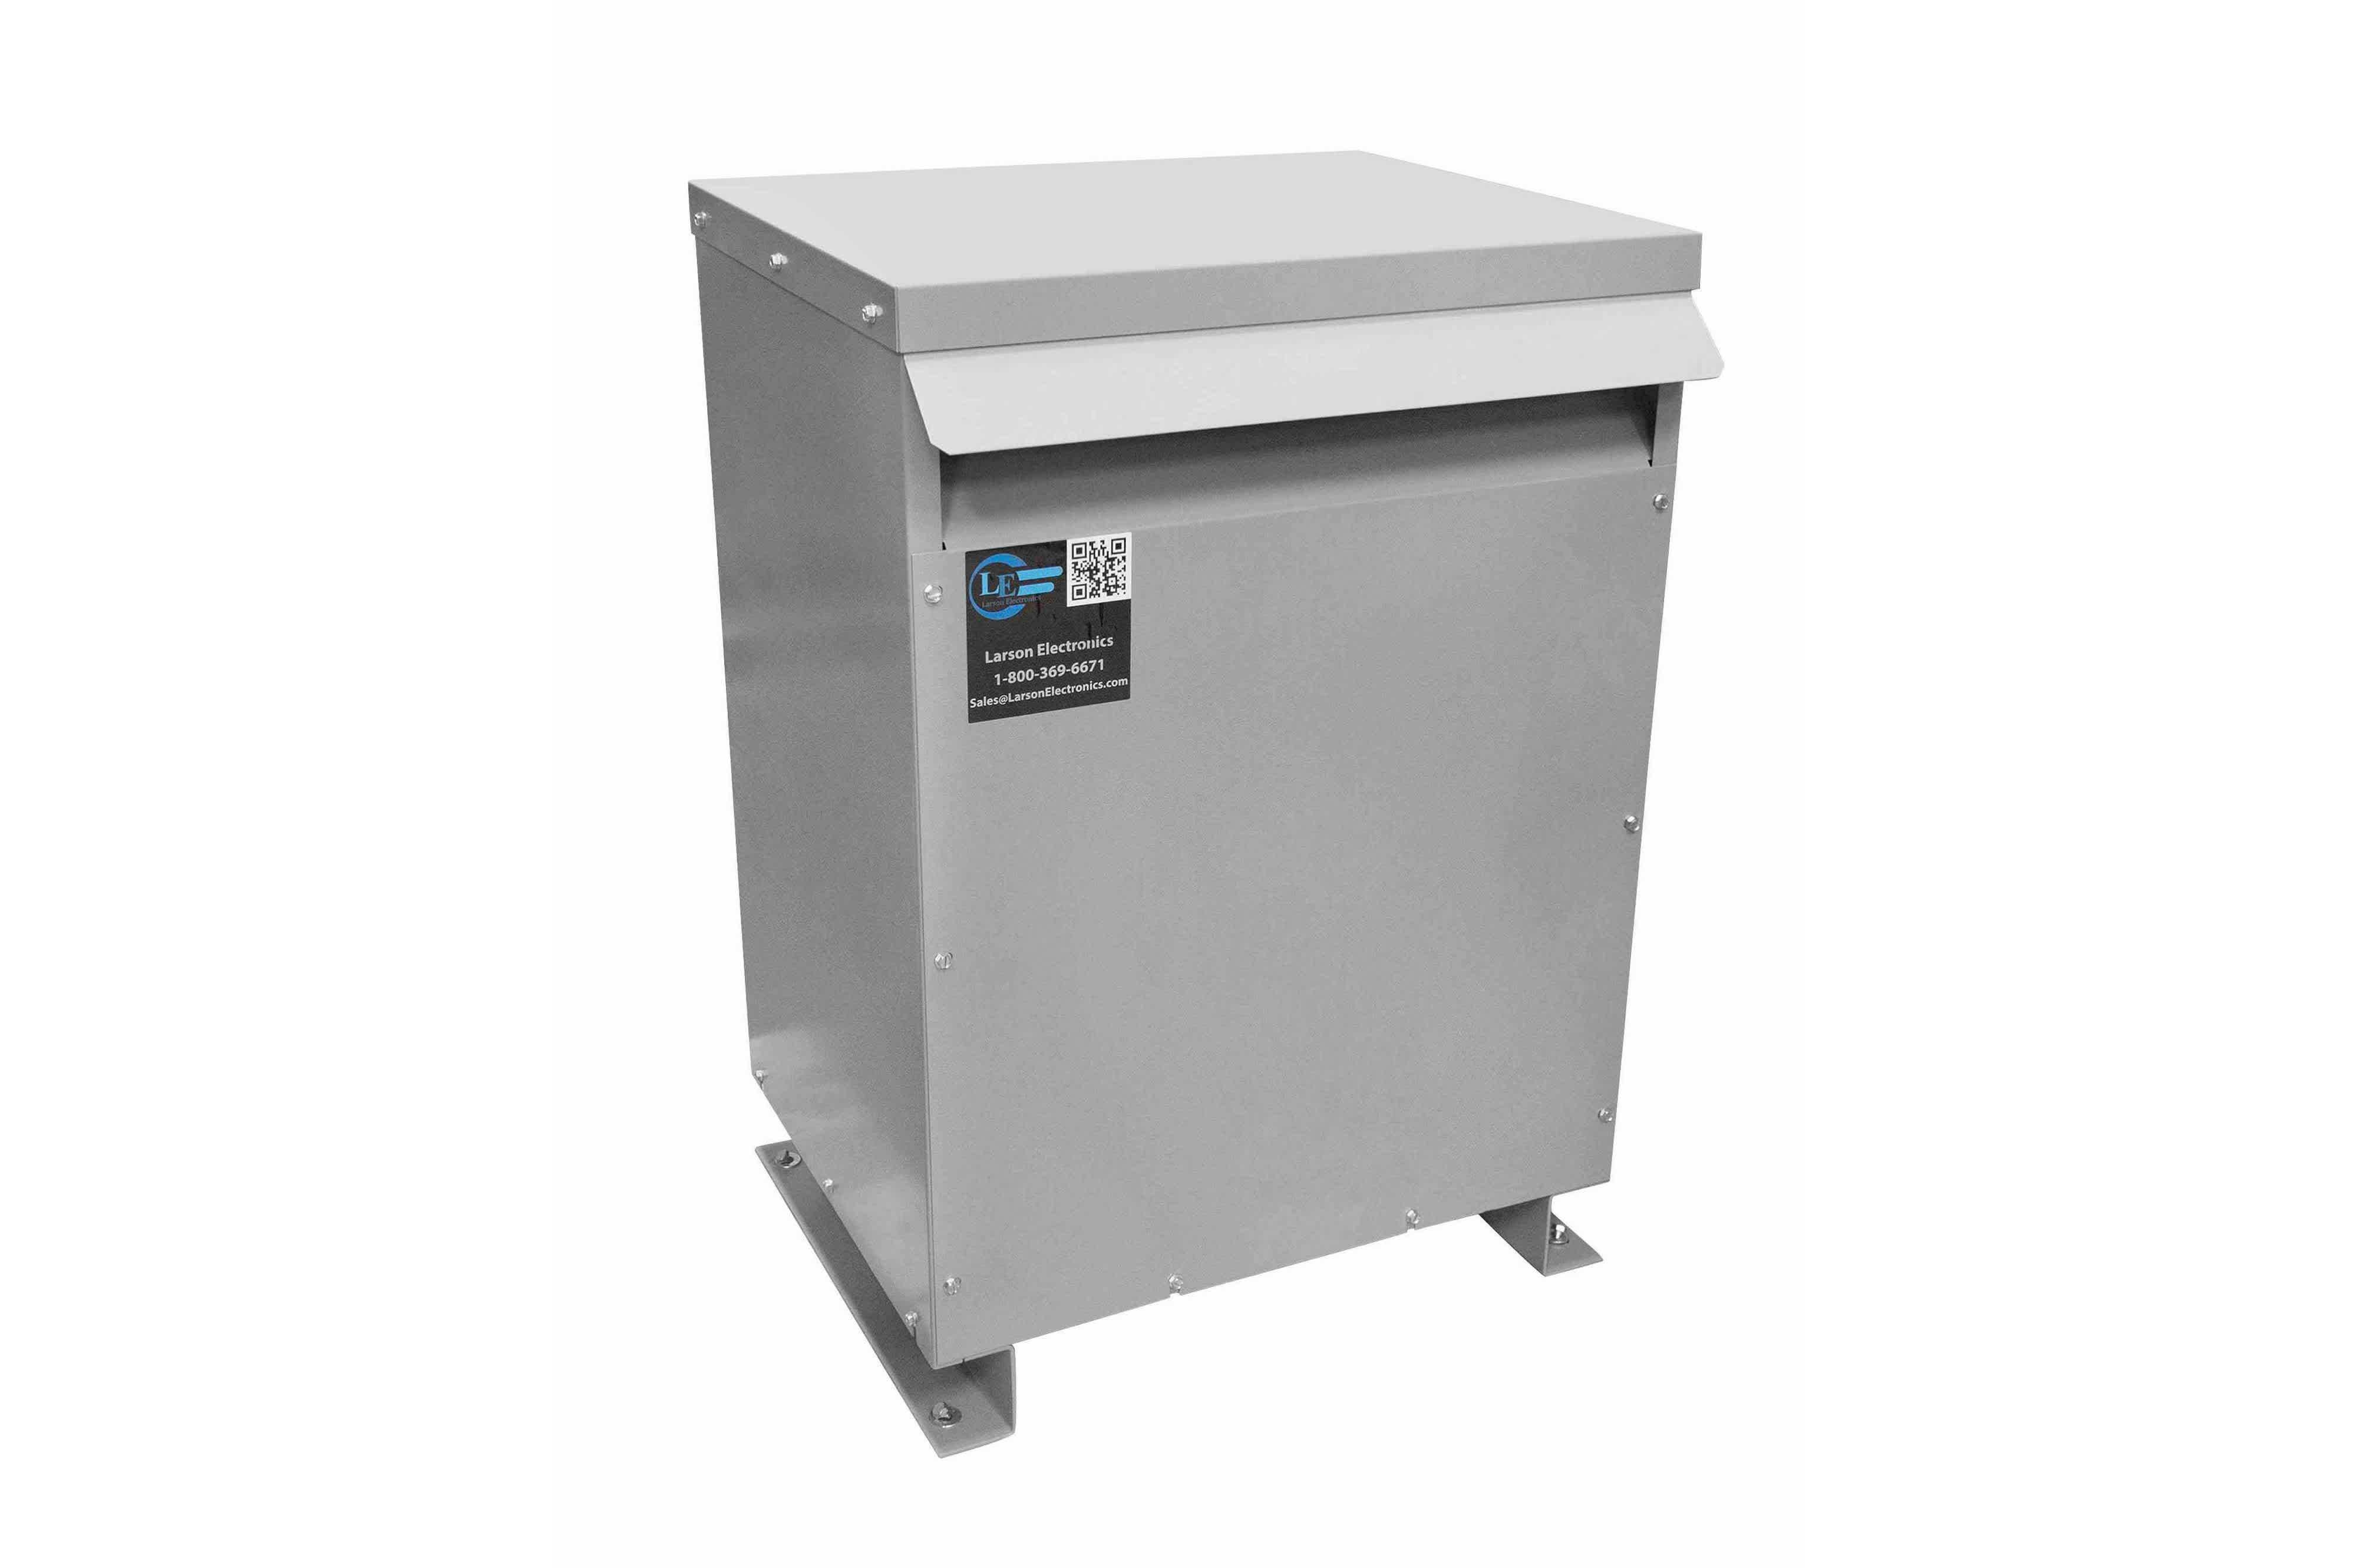 1000 kVA 3PH Isolation Transformer, 480V Wye Primary, 600V Delta Secondary, N3R, Ventilated, 60 Hz